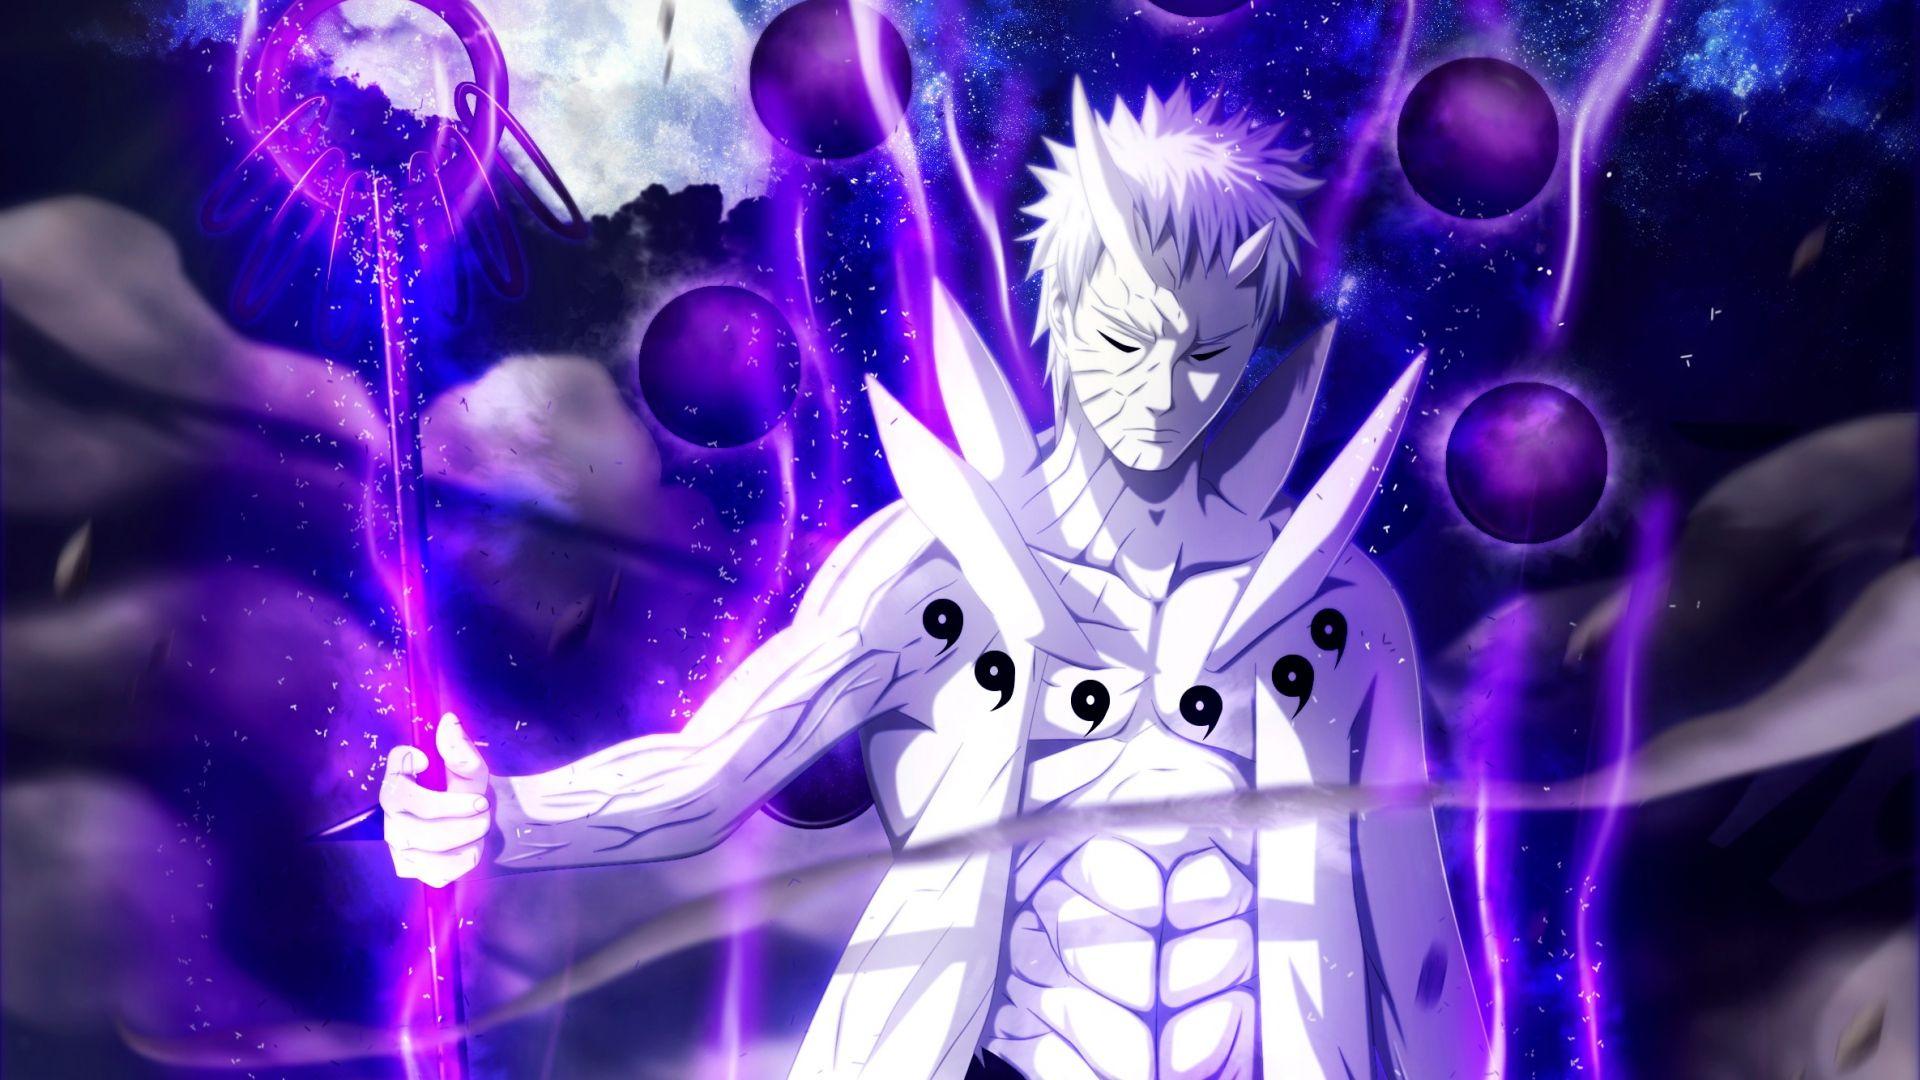 Wallpaper Bergerak Naruto